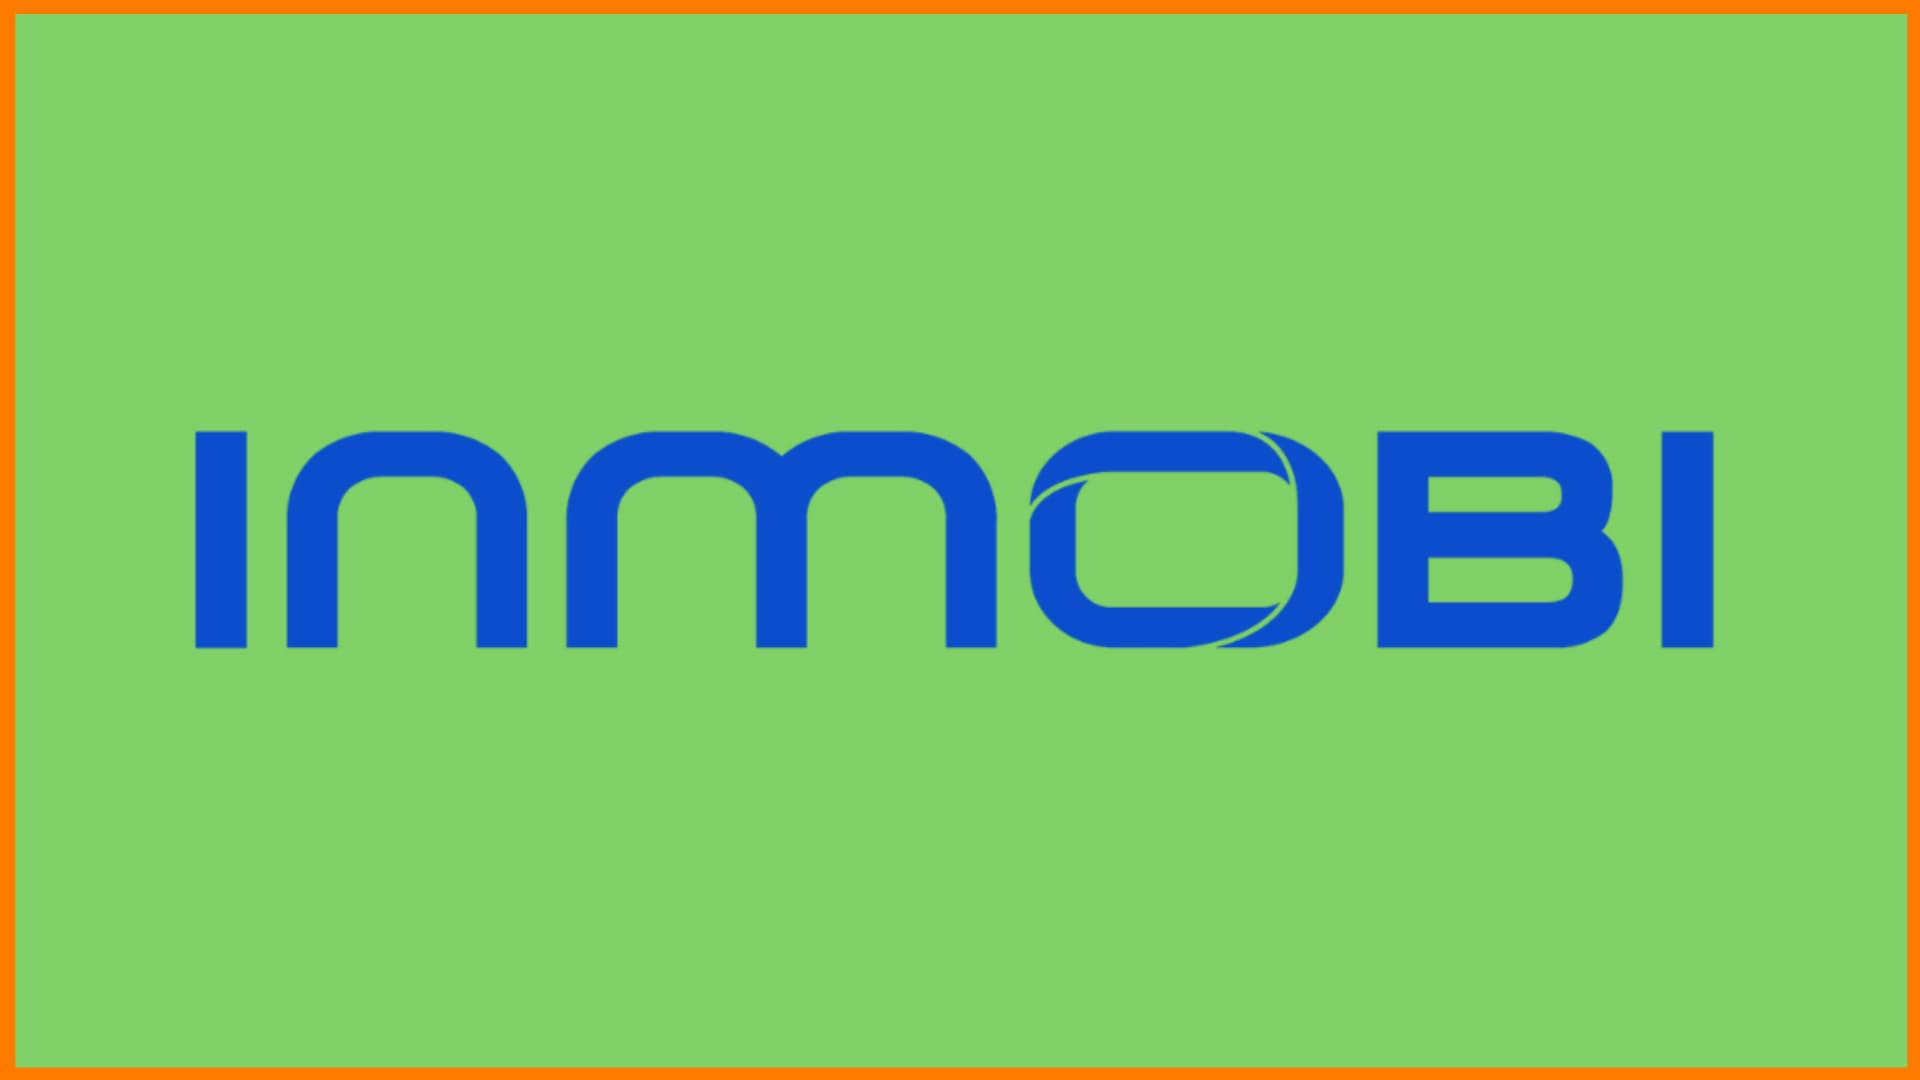 InMobi—Indian Mobile Advertising Tech Company